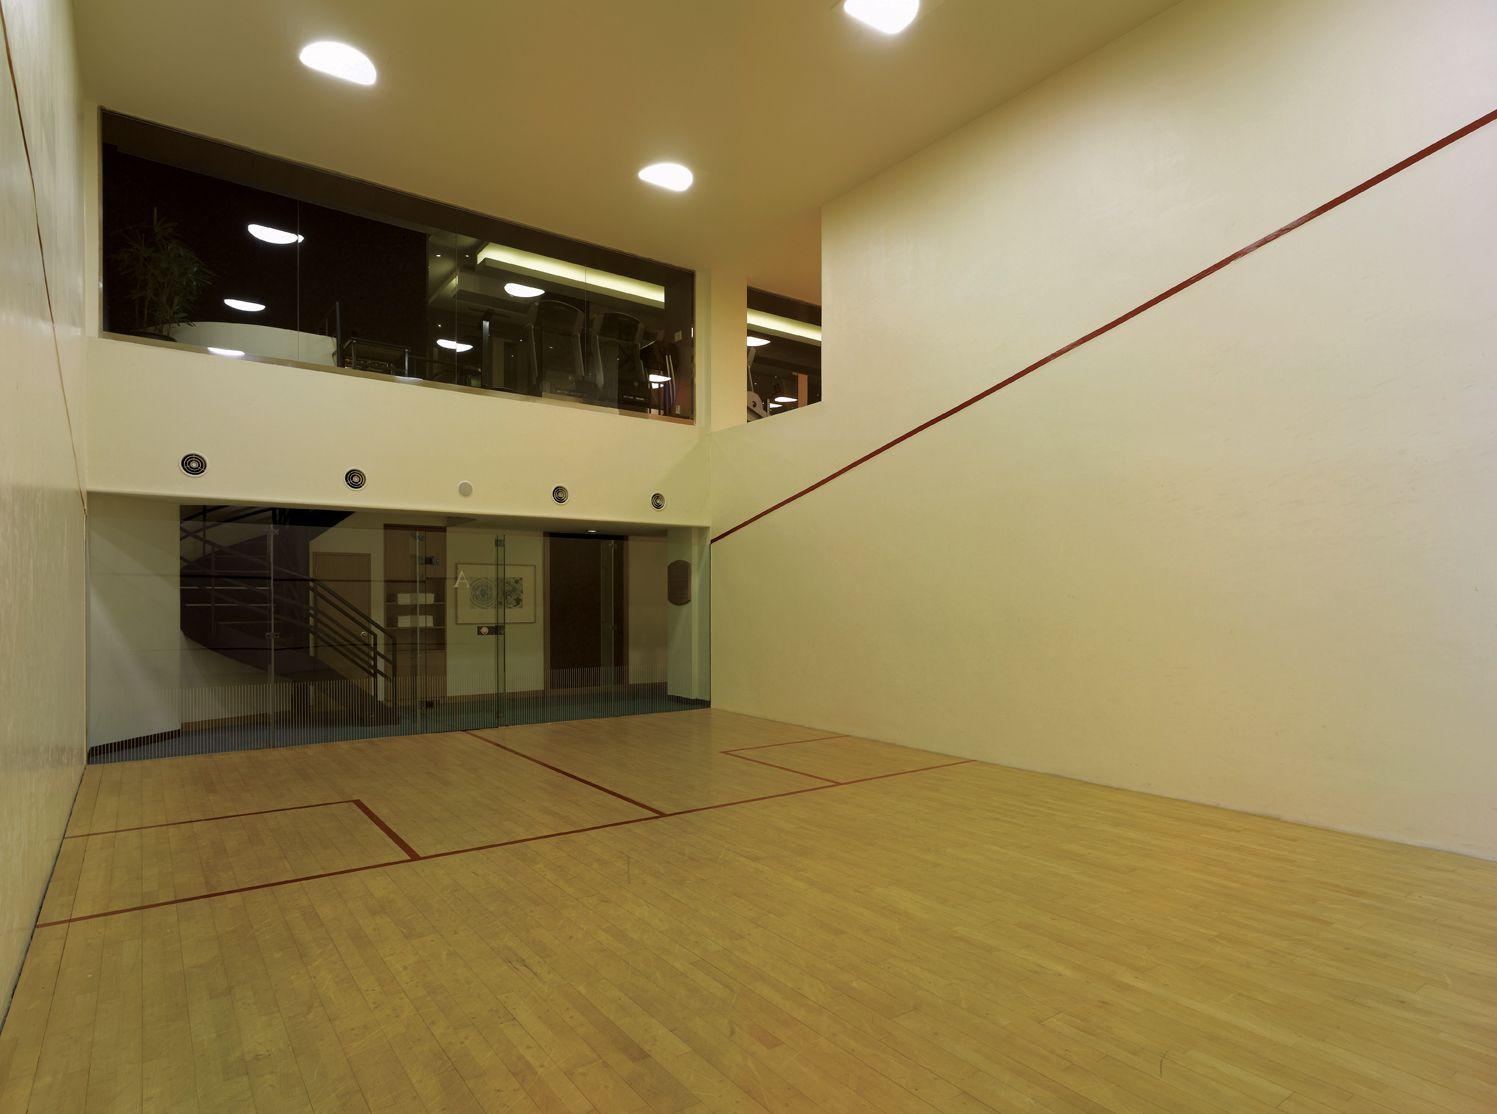 Grand Hyatt Seoul Facilities Racquetball Room #grandhyattseoul #grandhyattseoulgym